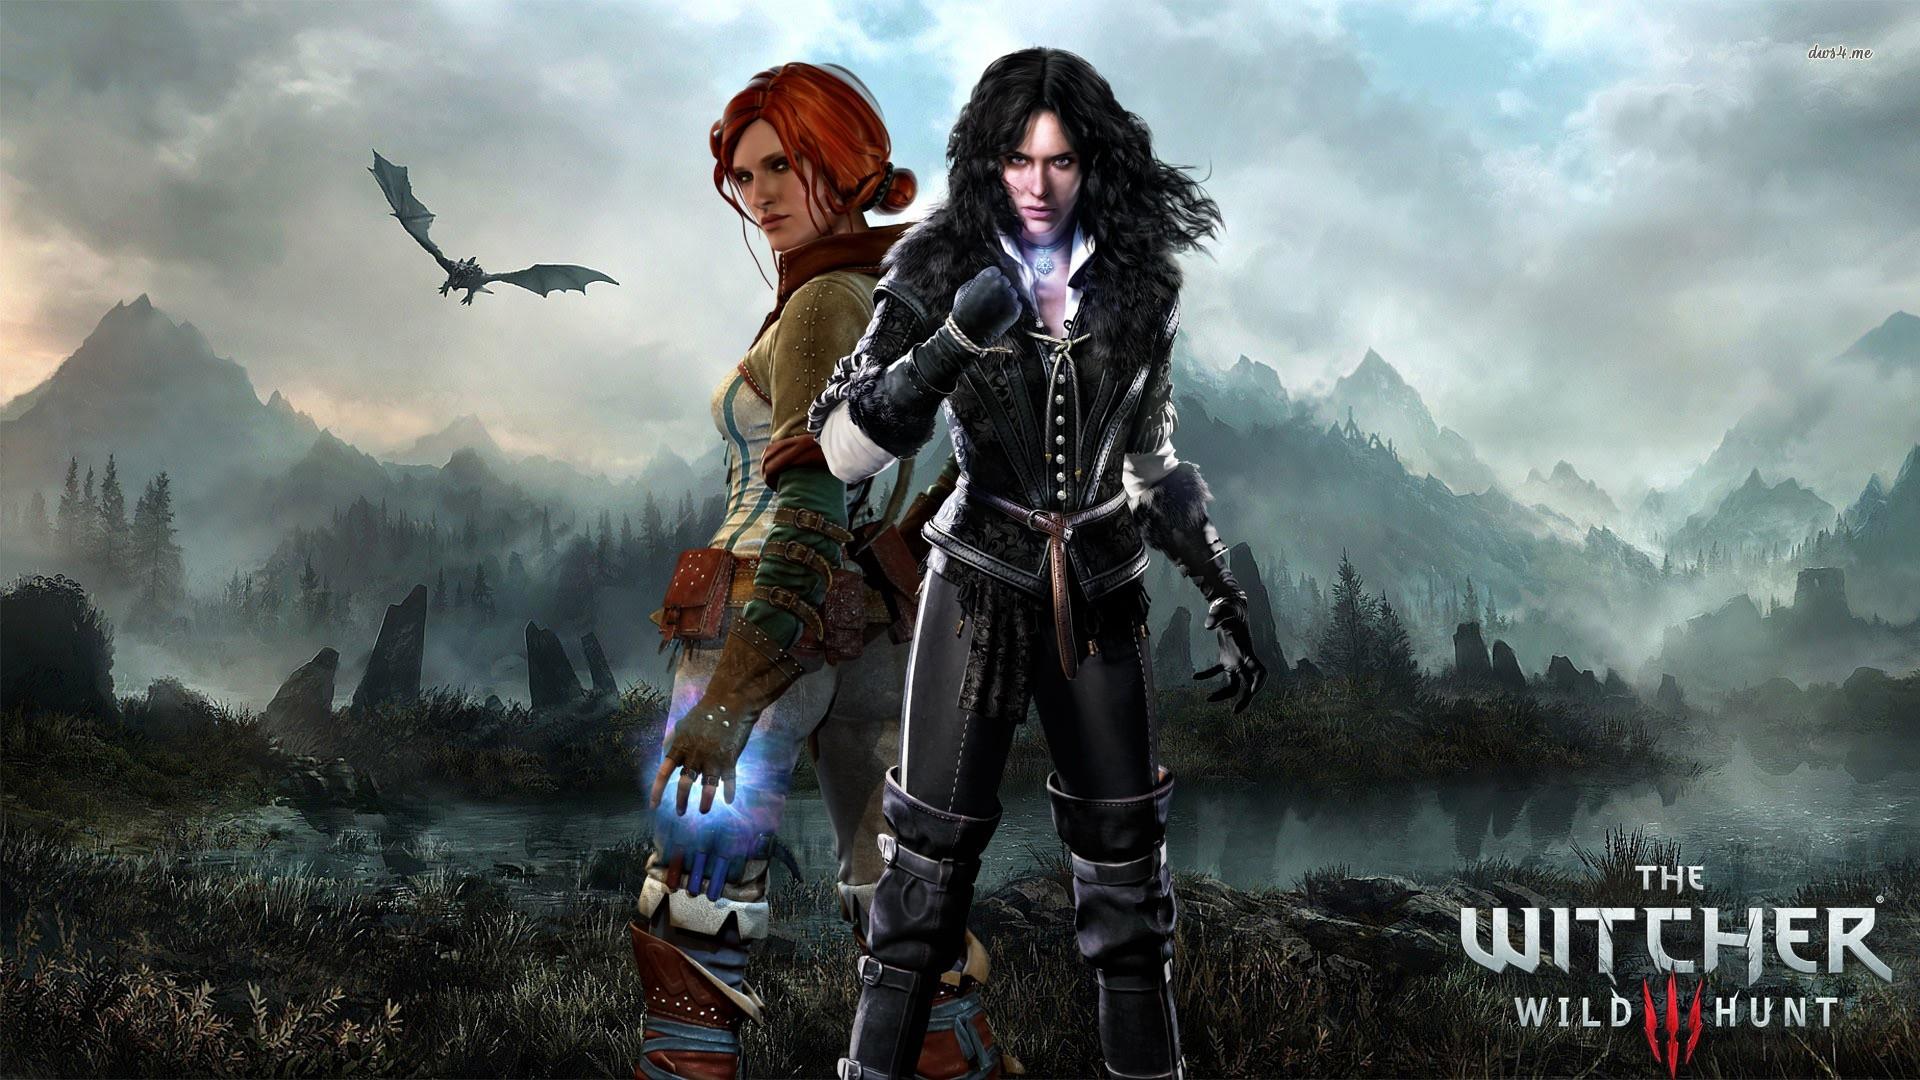 The Witcher 3: Wild Hunt, Triss Merigold, Yennefer Of Vengerberg Wallpapers  HD / Desktop and Mobile Backgrounds